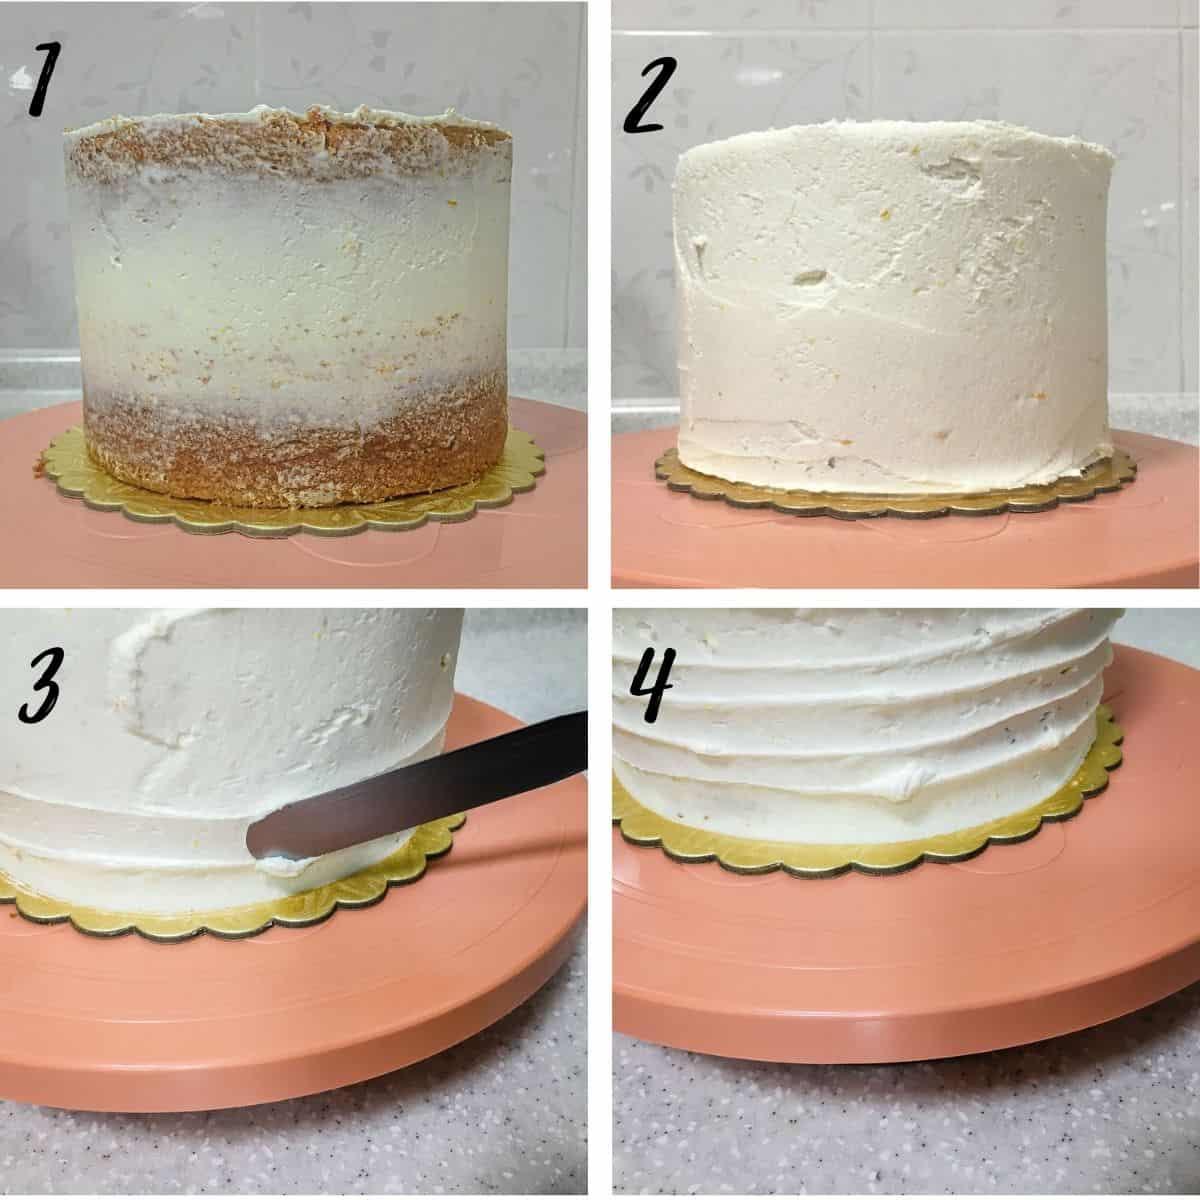 Making buttercream patterns on a buttercream cake